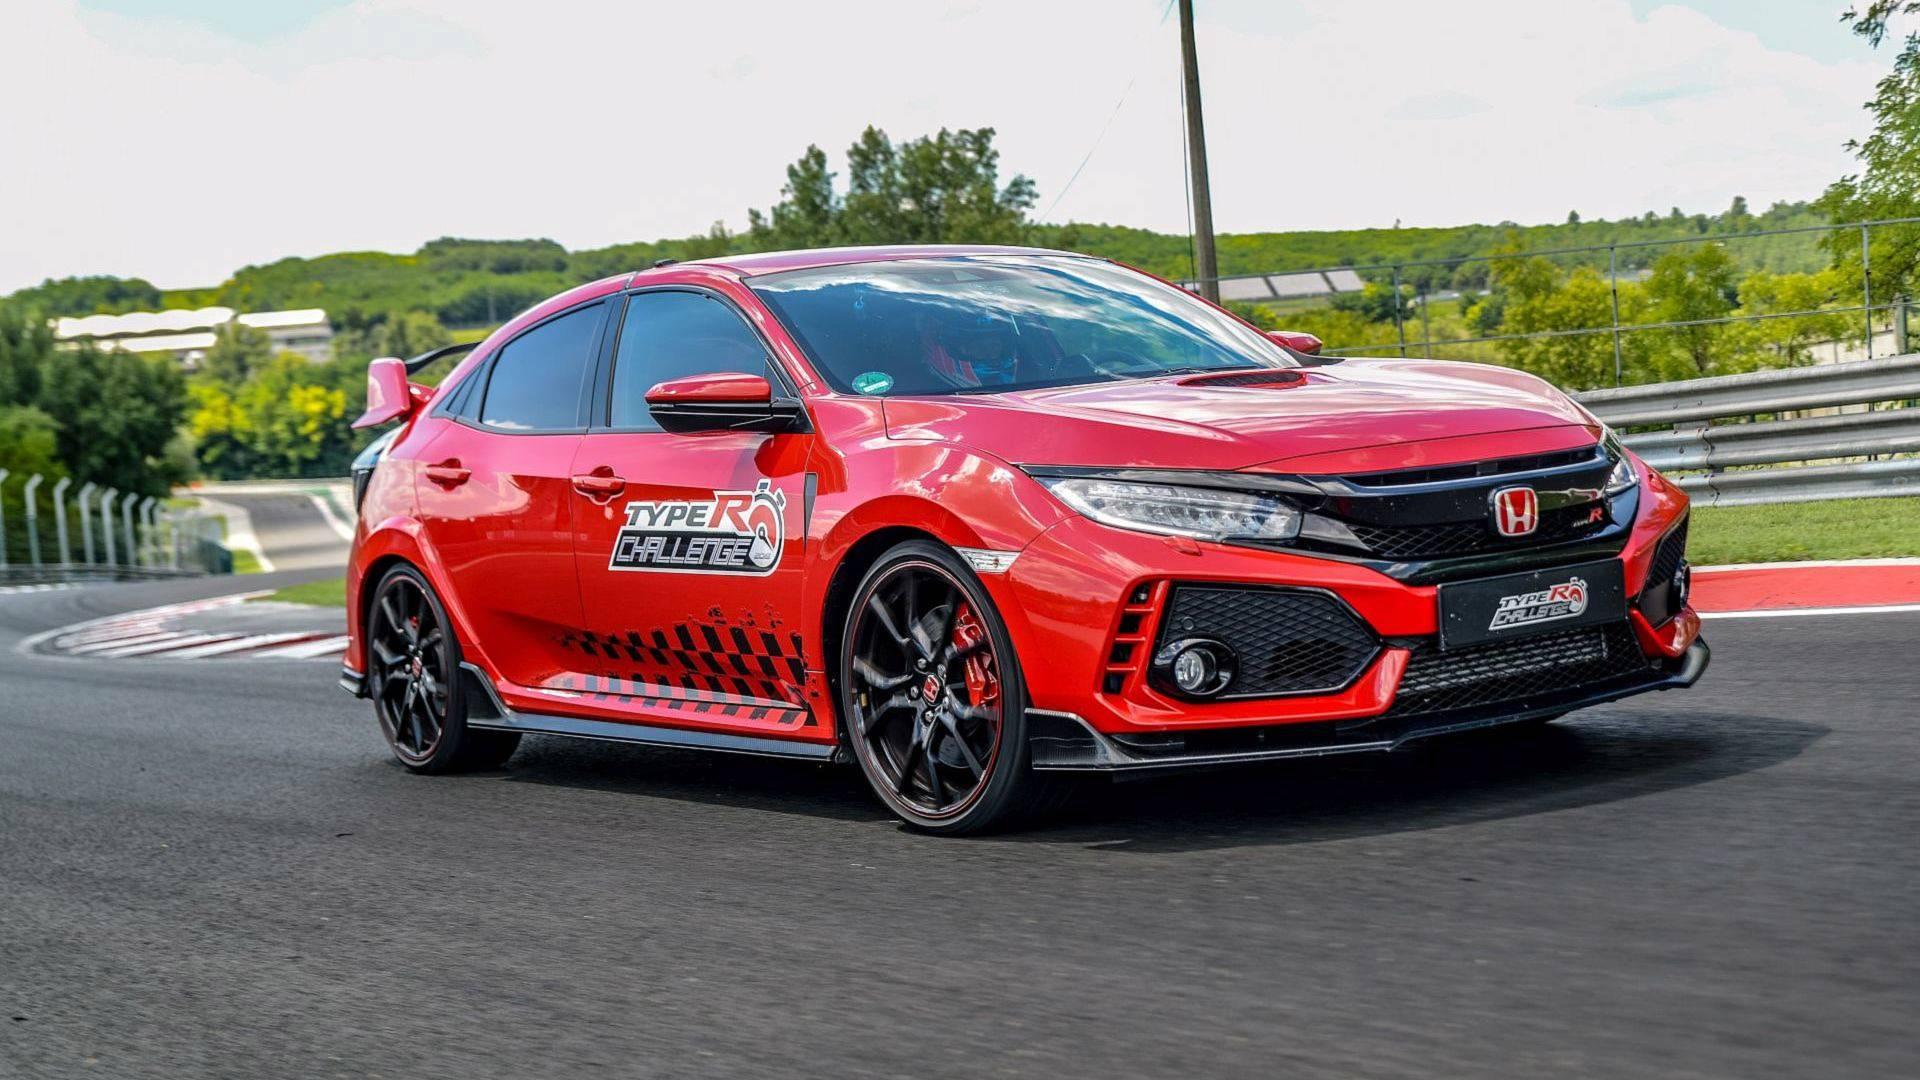 Un nou record mondial pentru Honda Civic Type R. Modelul nipon a cucerit circuitul Hungaroring